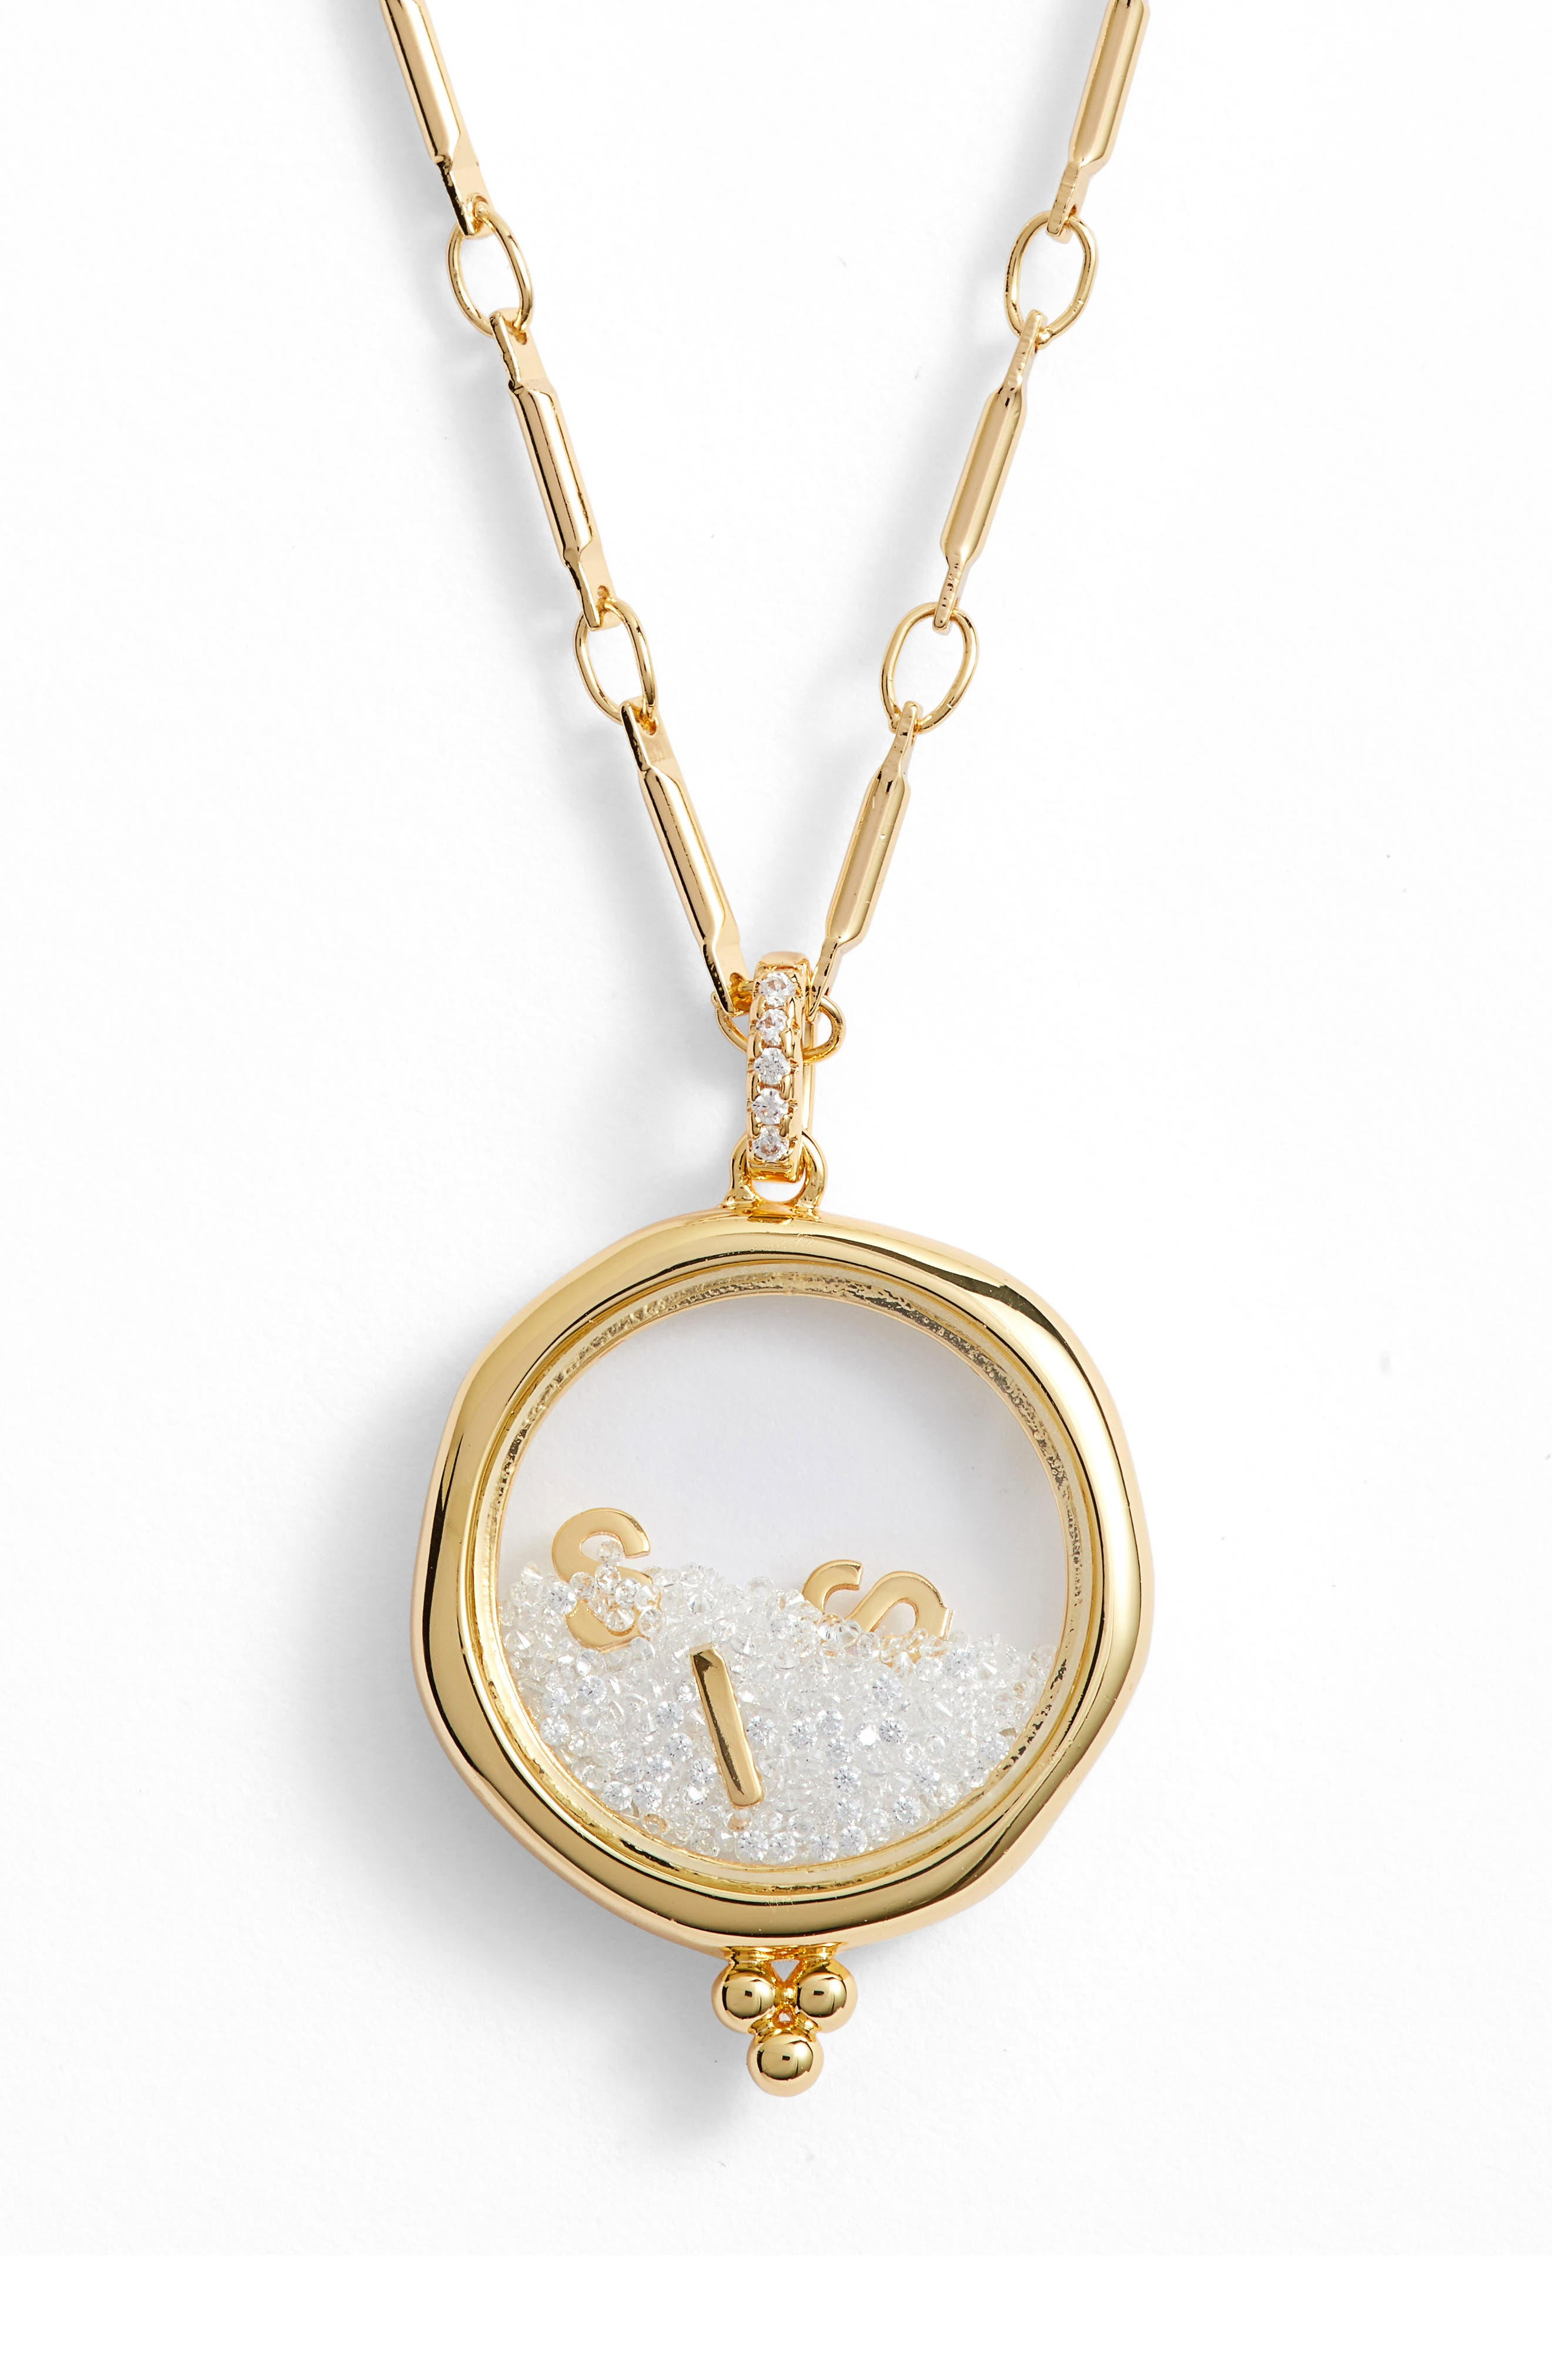 LULU DK X Kristina Schulman Sisters Shaker Pendant Necklace in Gold